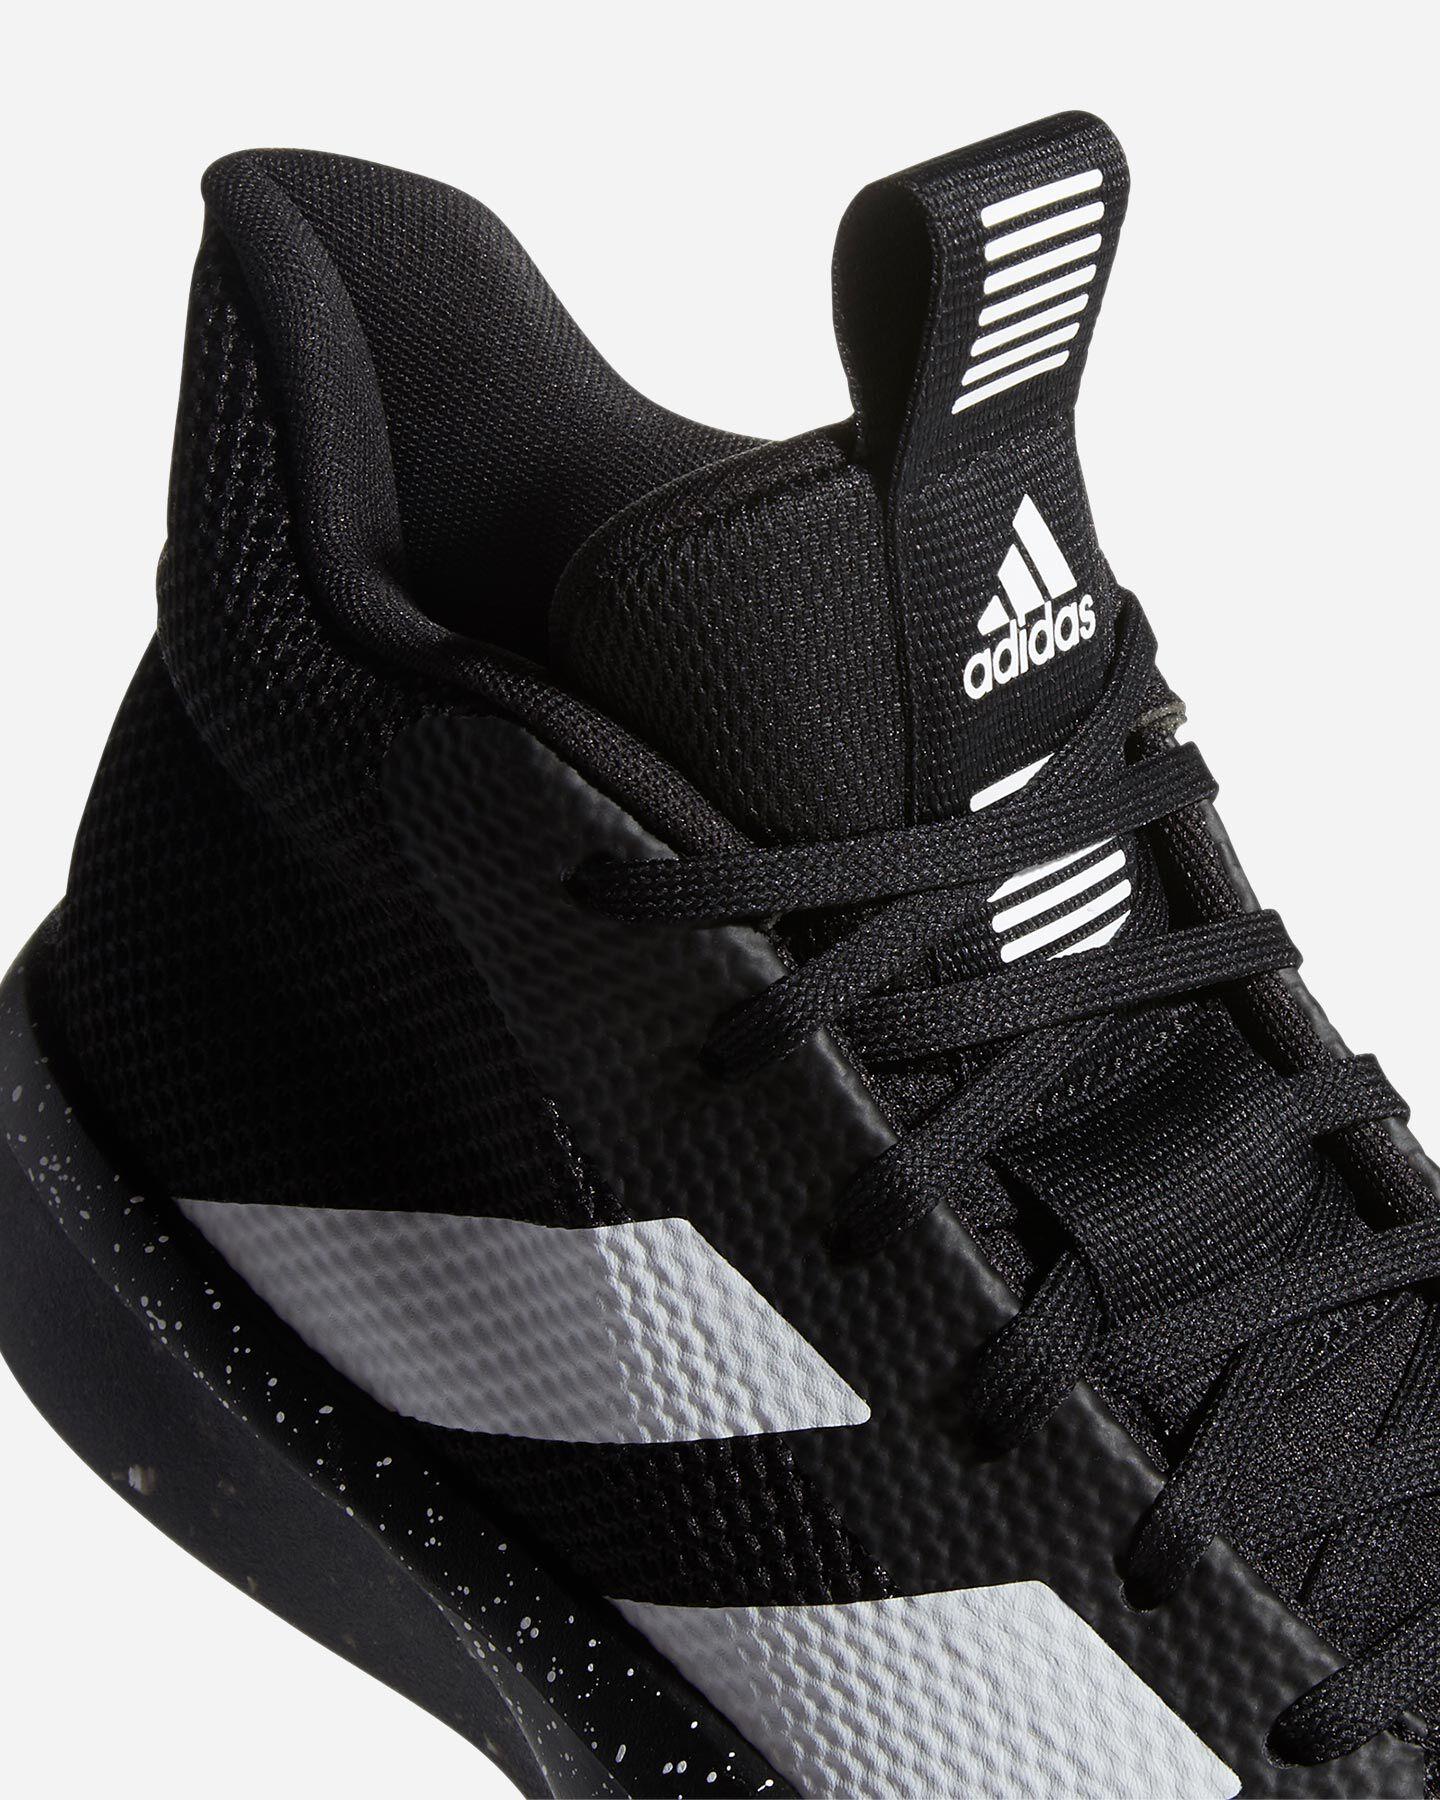 Scarpe basket ADIDAS PRO NEXT 2019 M S5151884 scatto 4